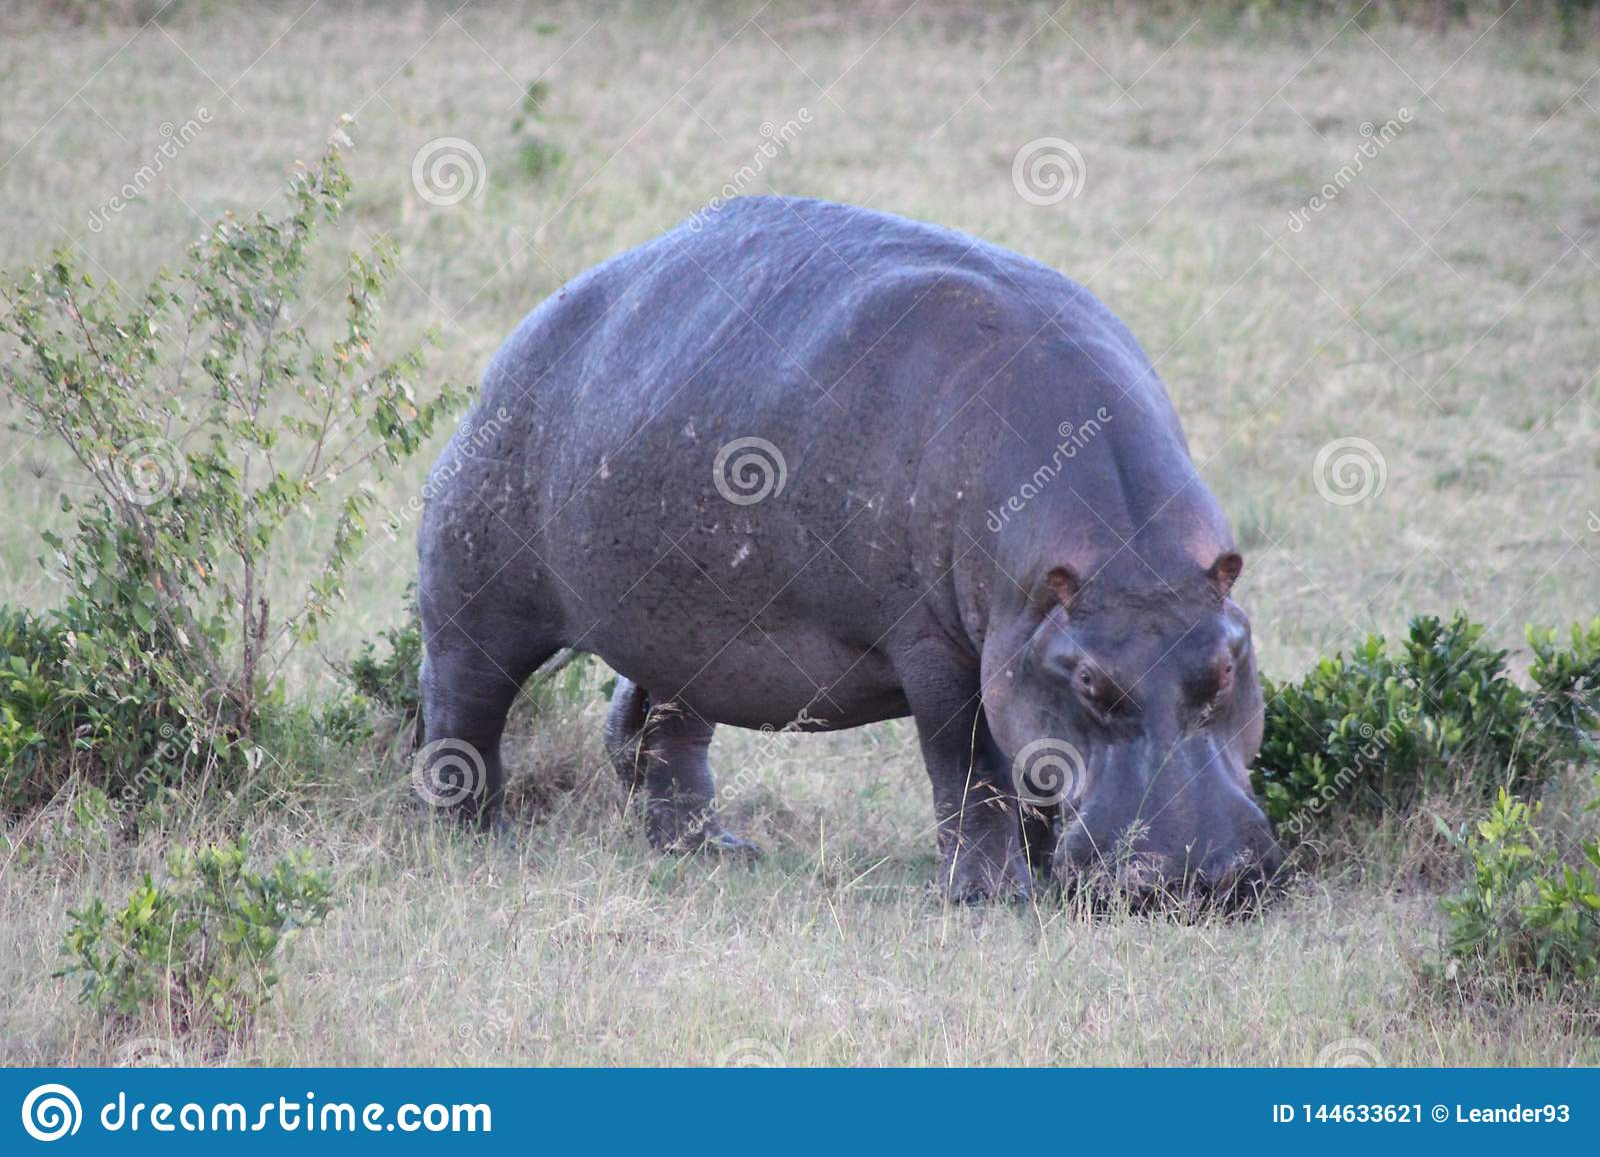 Hippo grazing grass on the savanna